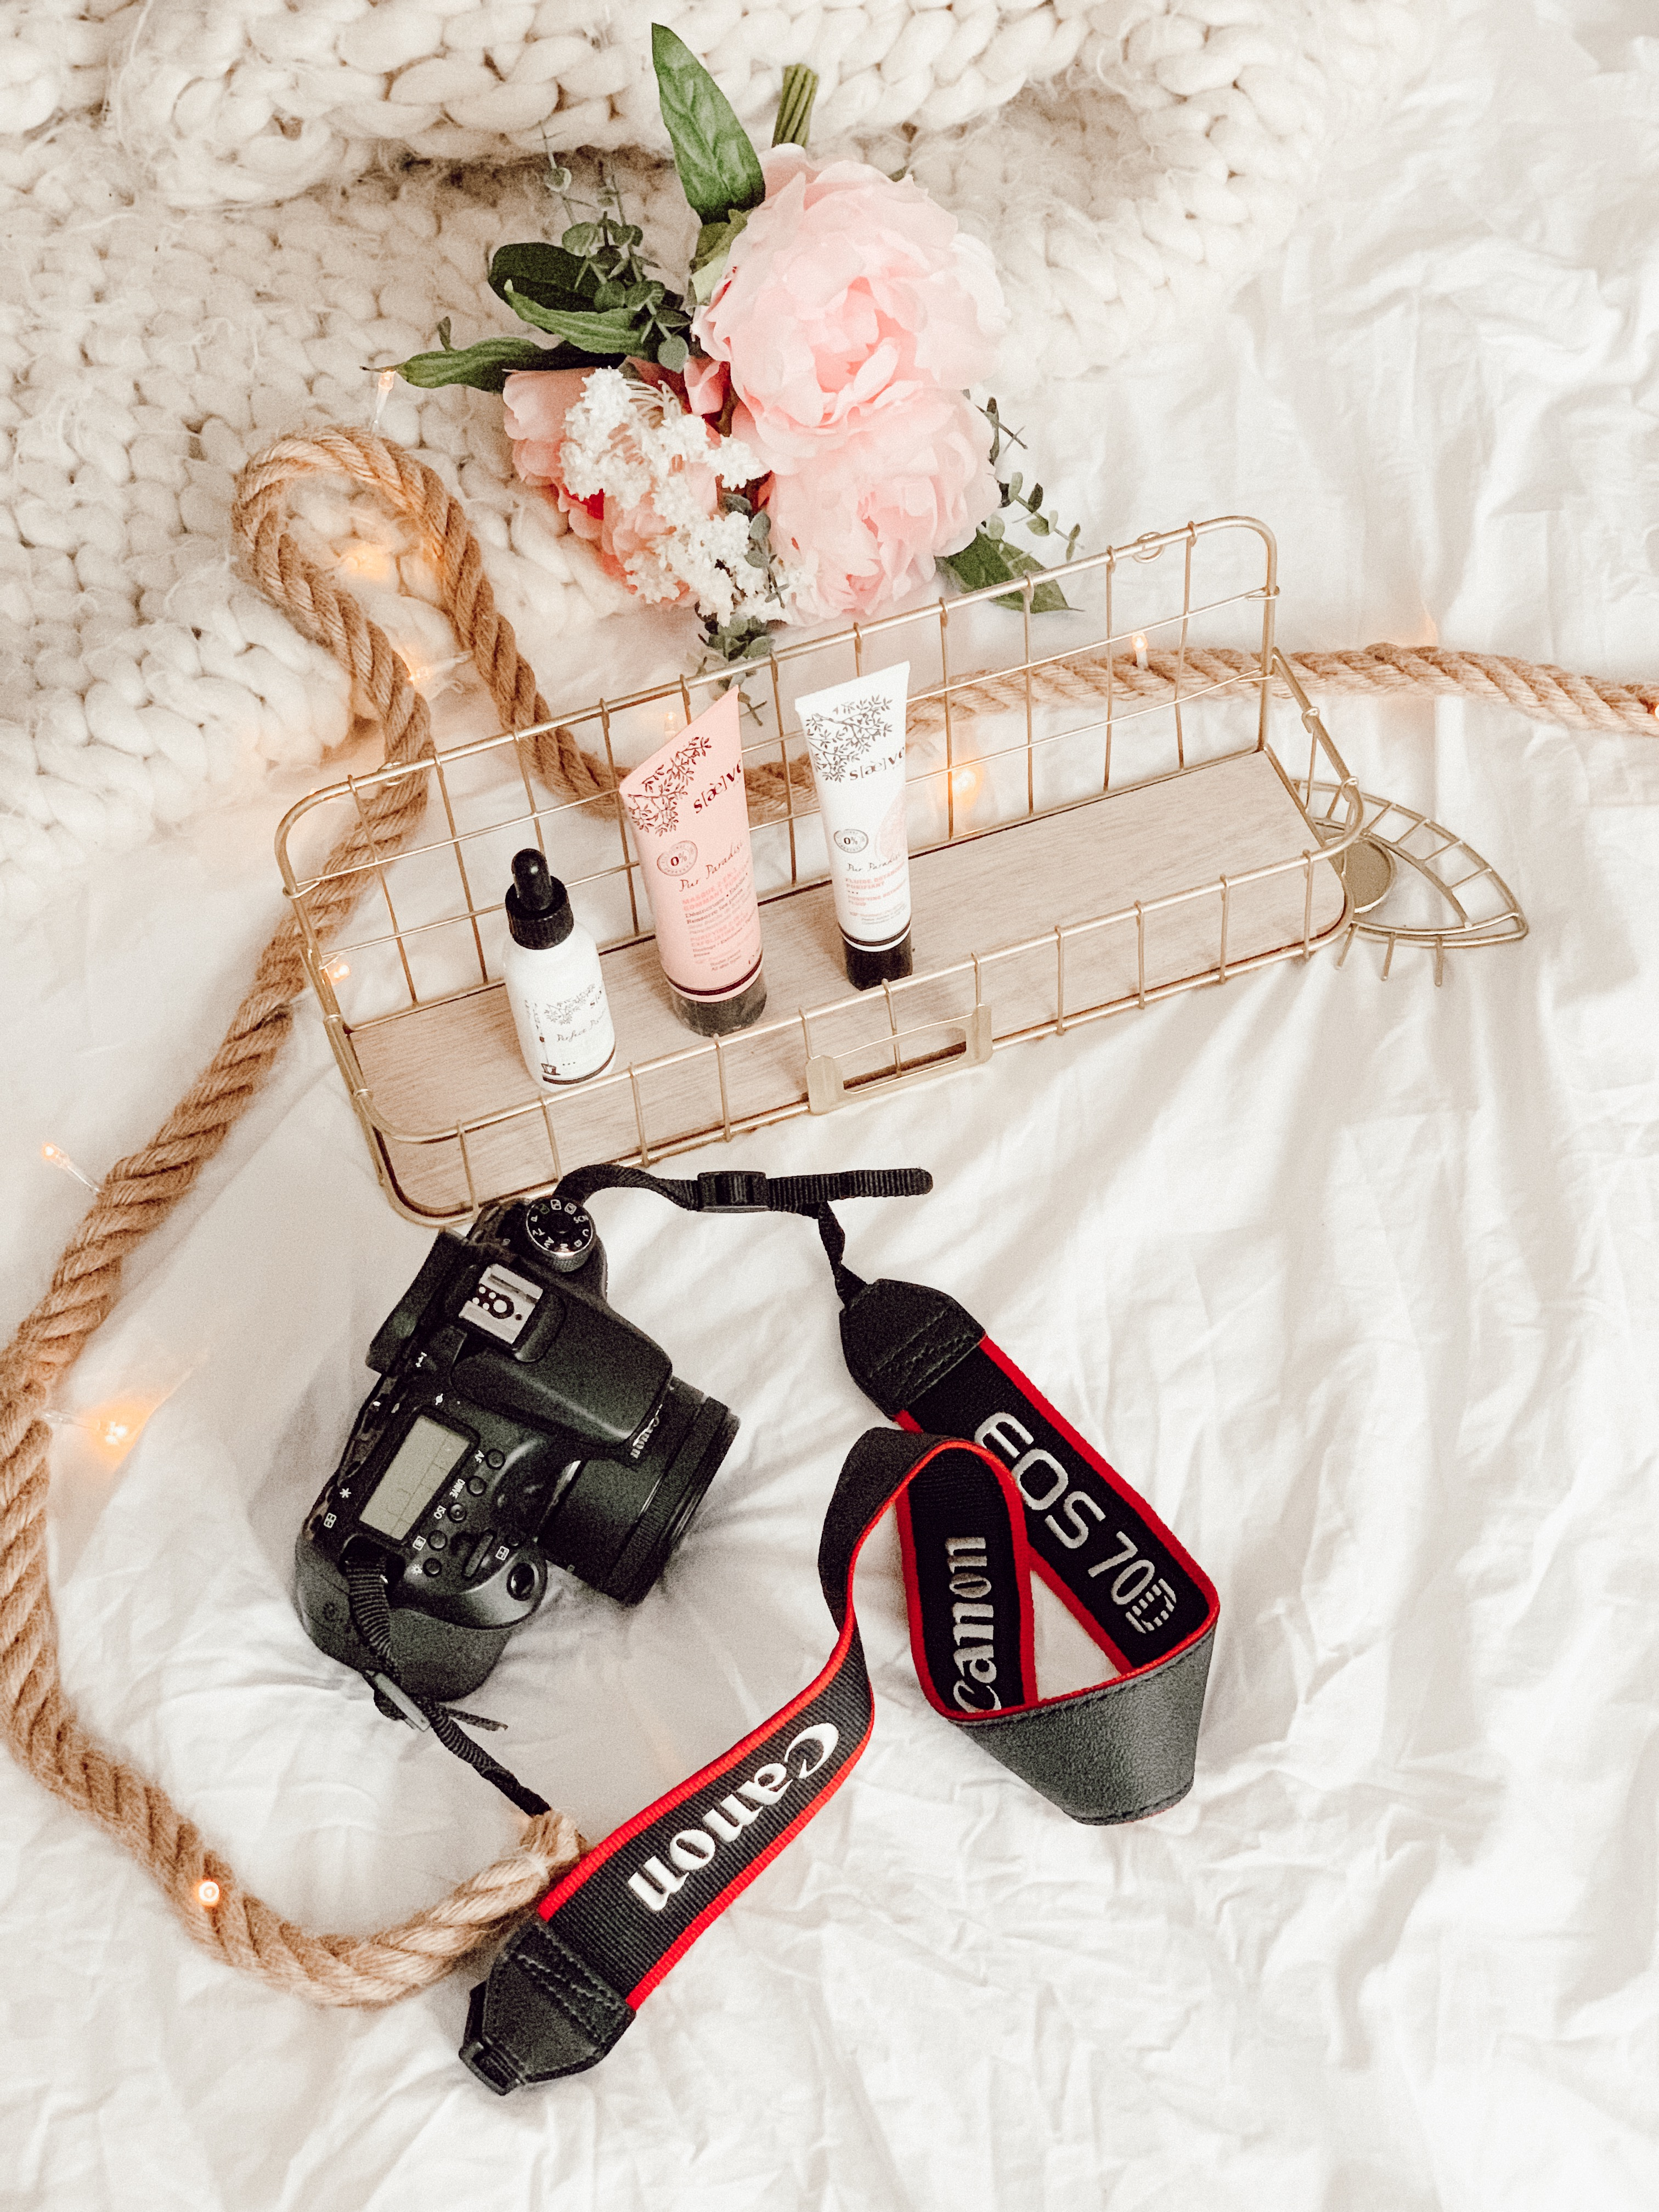 photos-exemple-retouches-instagram-preset-filtres